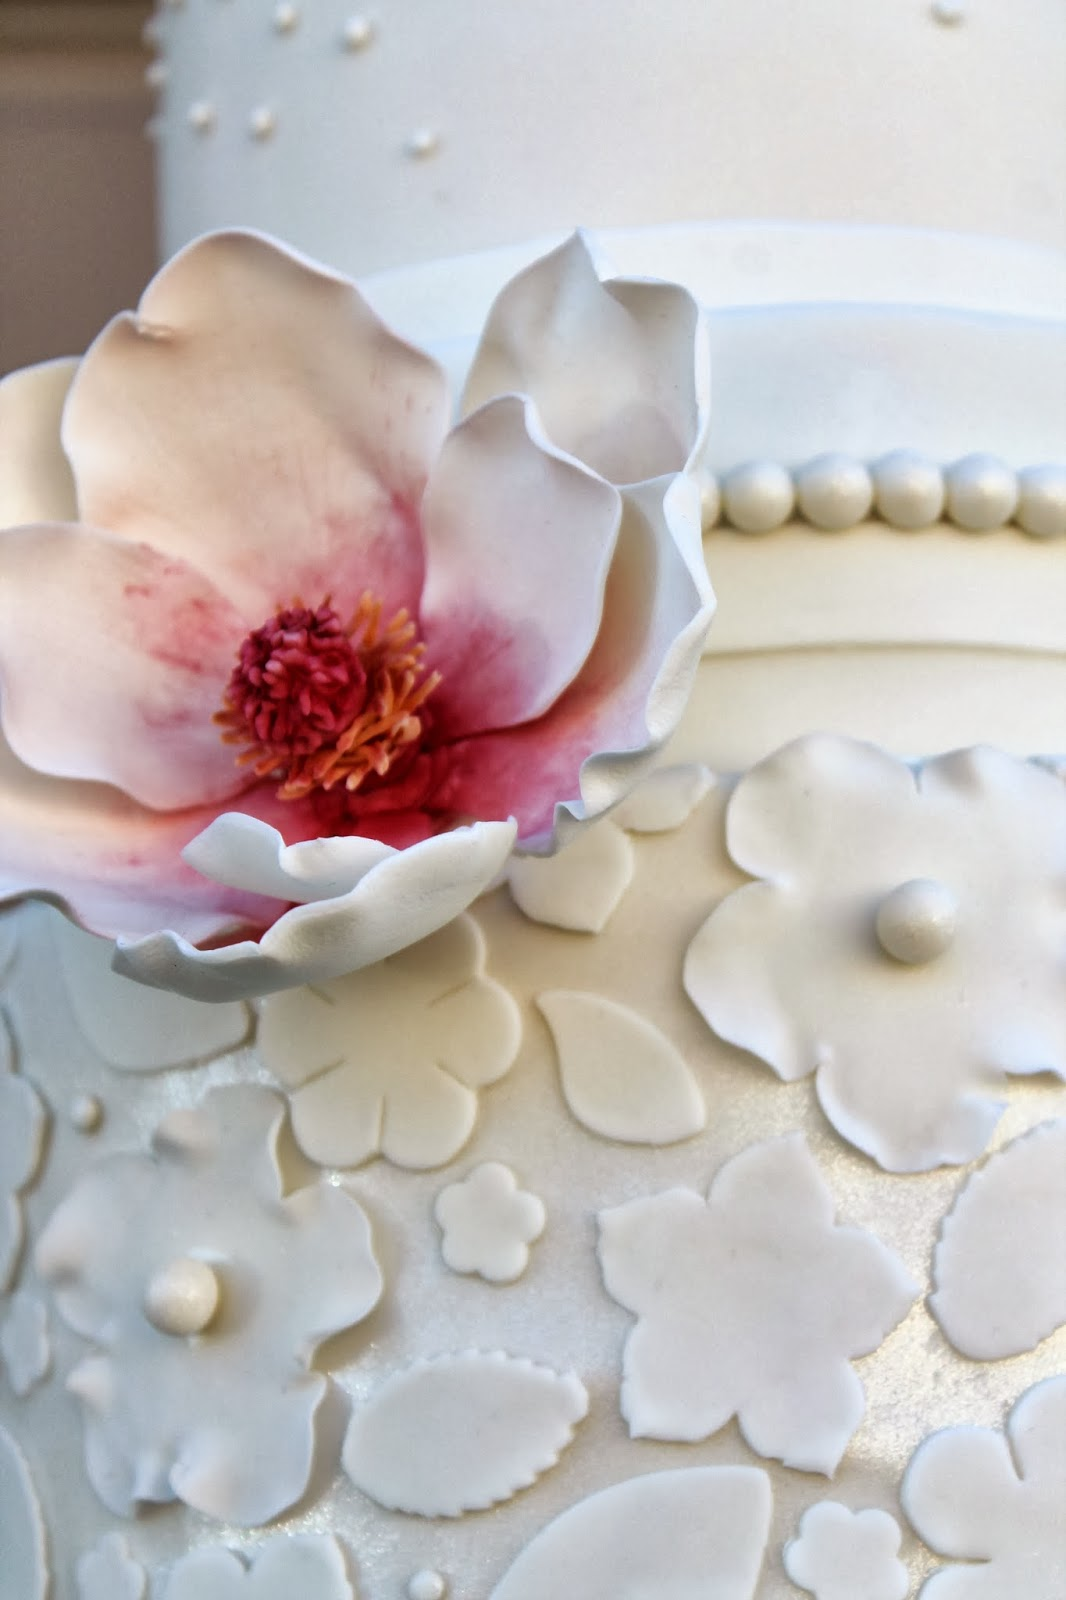 Wedding Cake Flavored Cake Balls Recipe